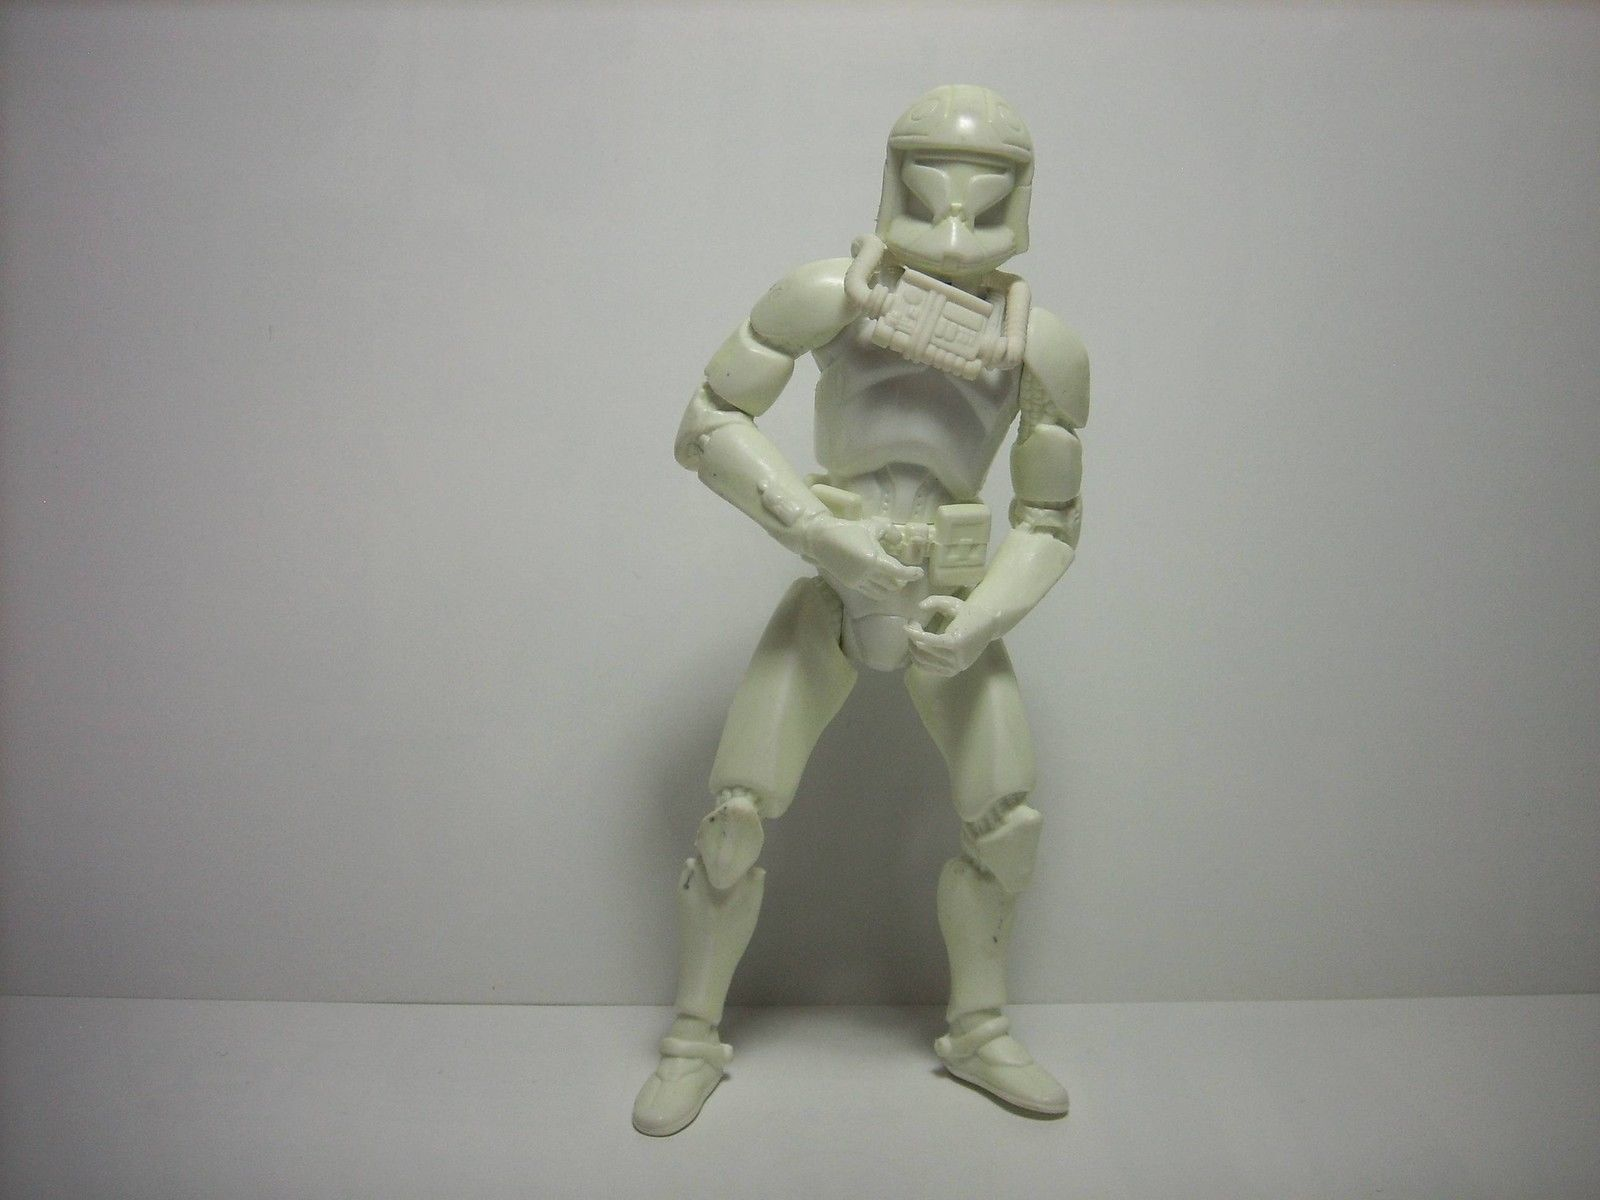 Star - wars - prototyp - klon trooper - 2002 - saga aotc kampfhubschrauber - pilot